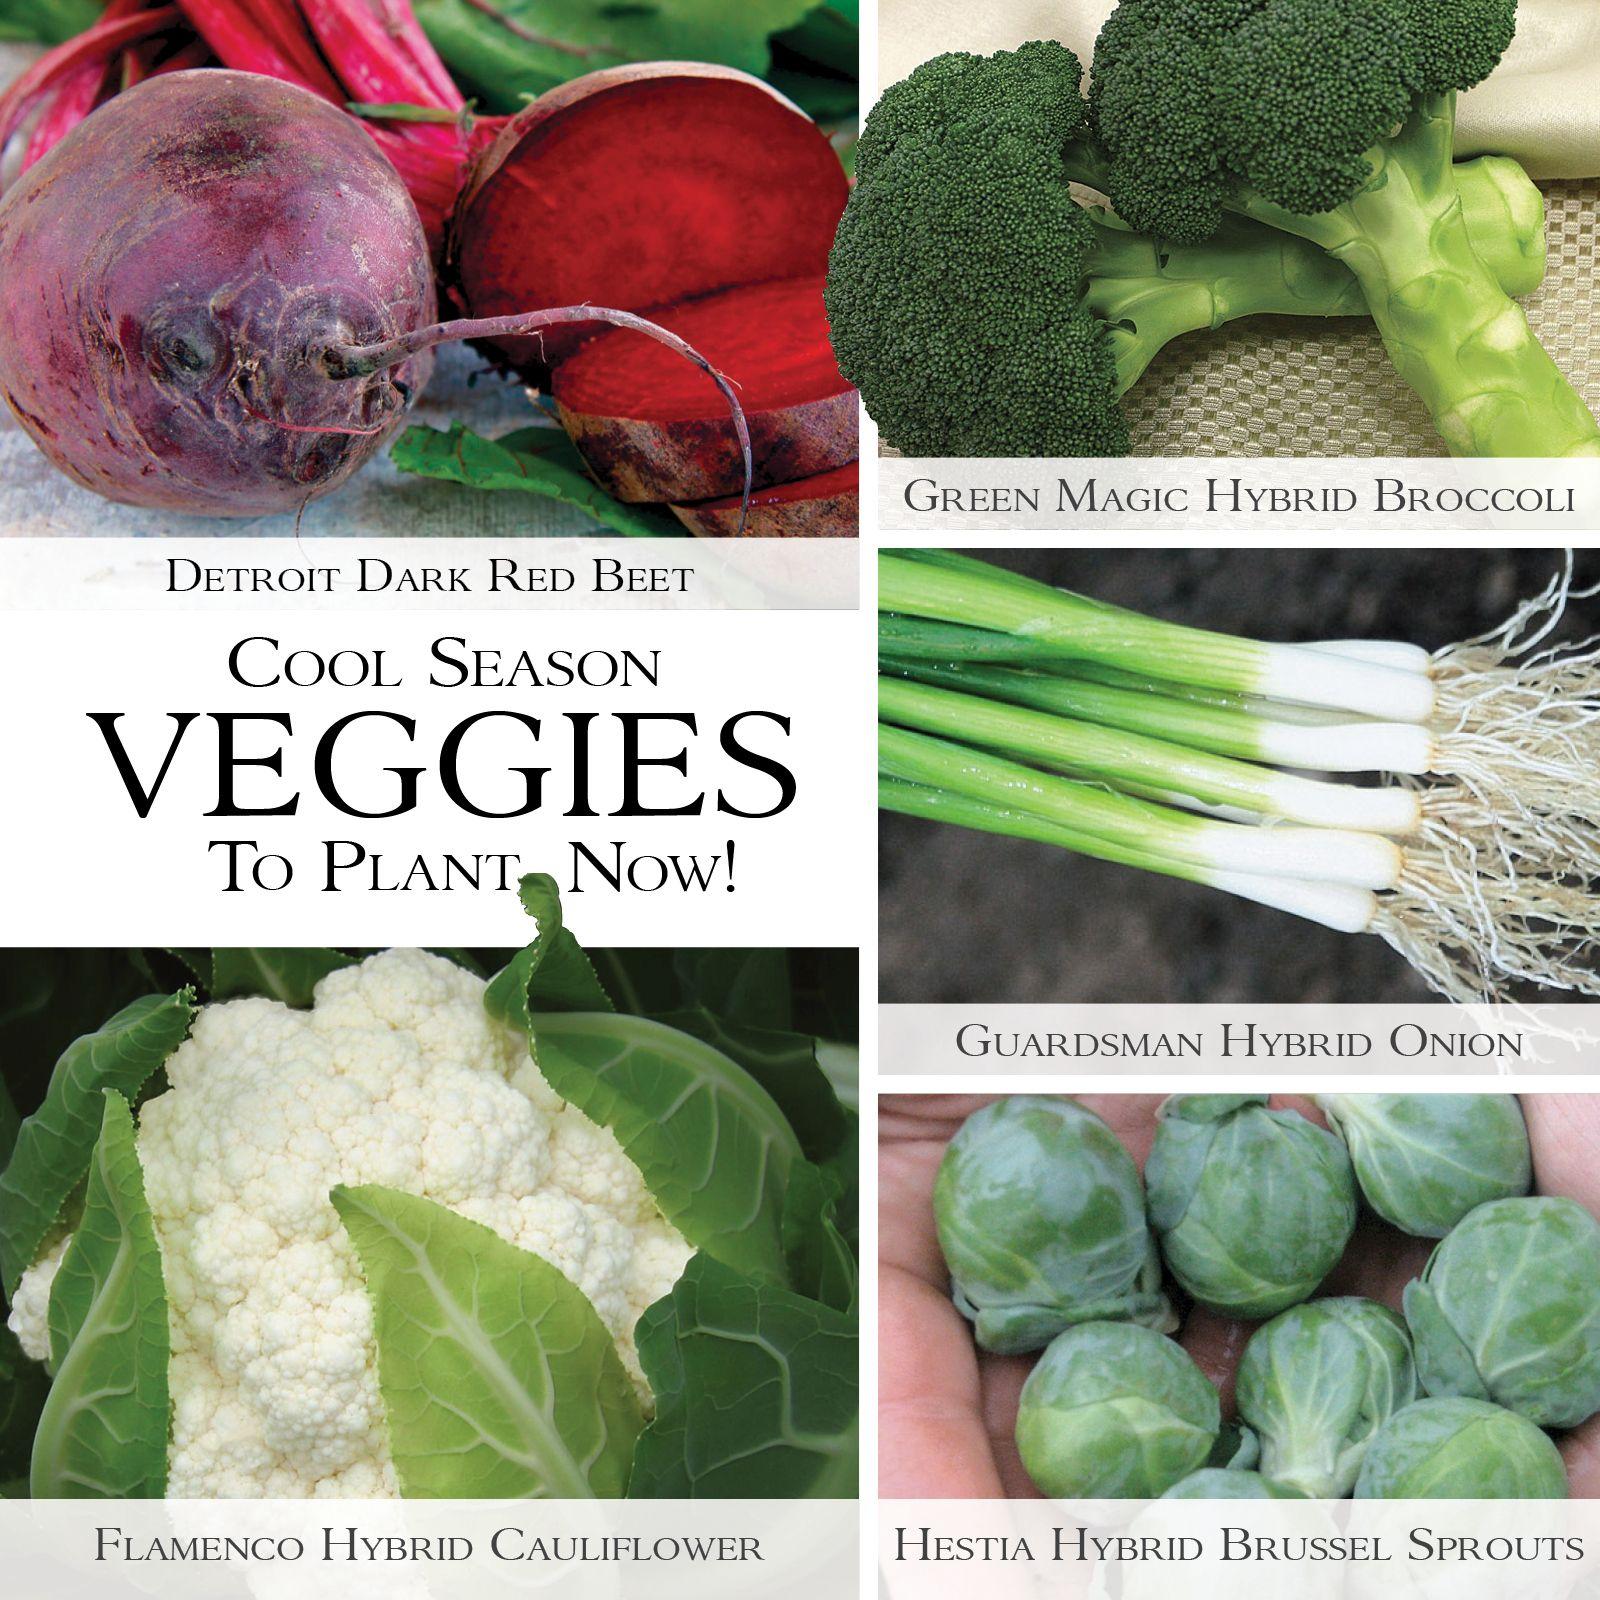 Cool Season Veggies To Plant Now Veggies Healthyrecipes Gardening Dieting Healthy Growing Vegetables Vegetable Seed Vegetable Seeds For Sale